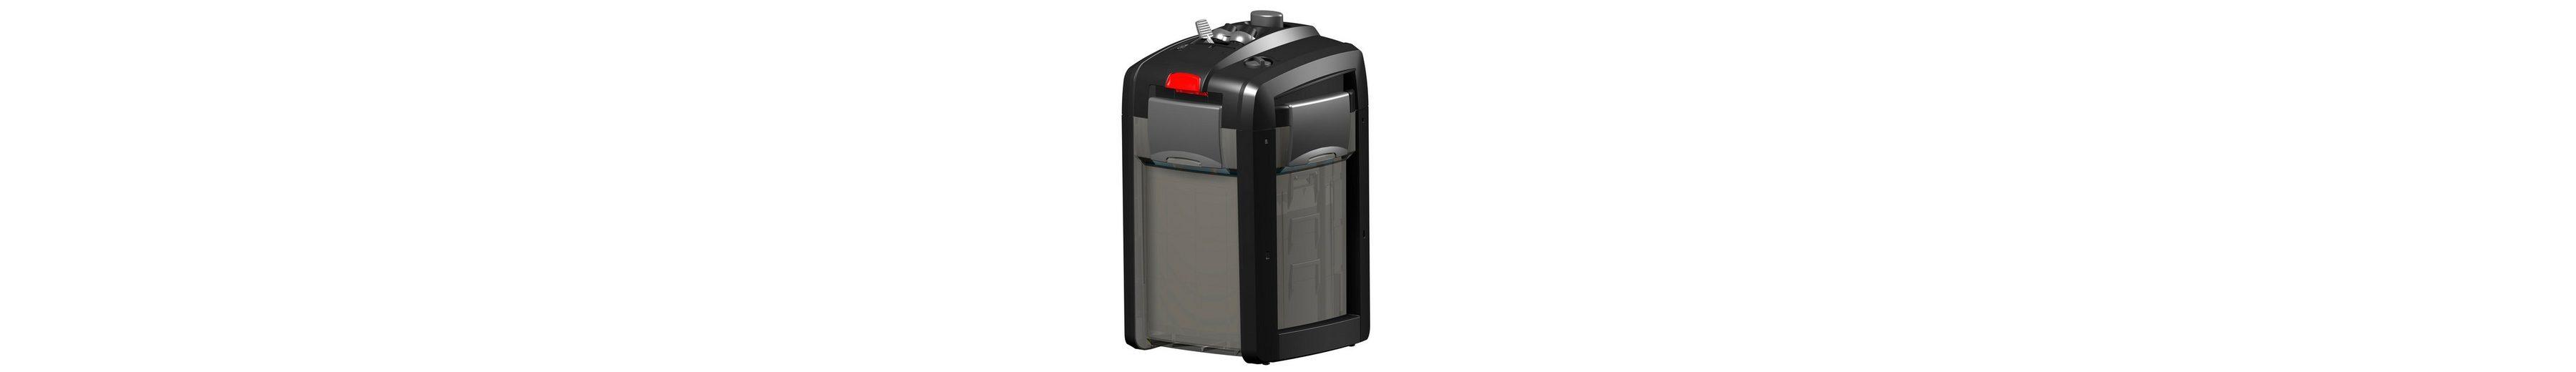 Aquarienfilter »professionel 4e 350 Range Extender«